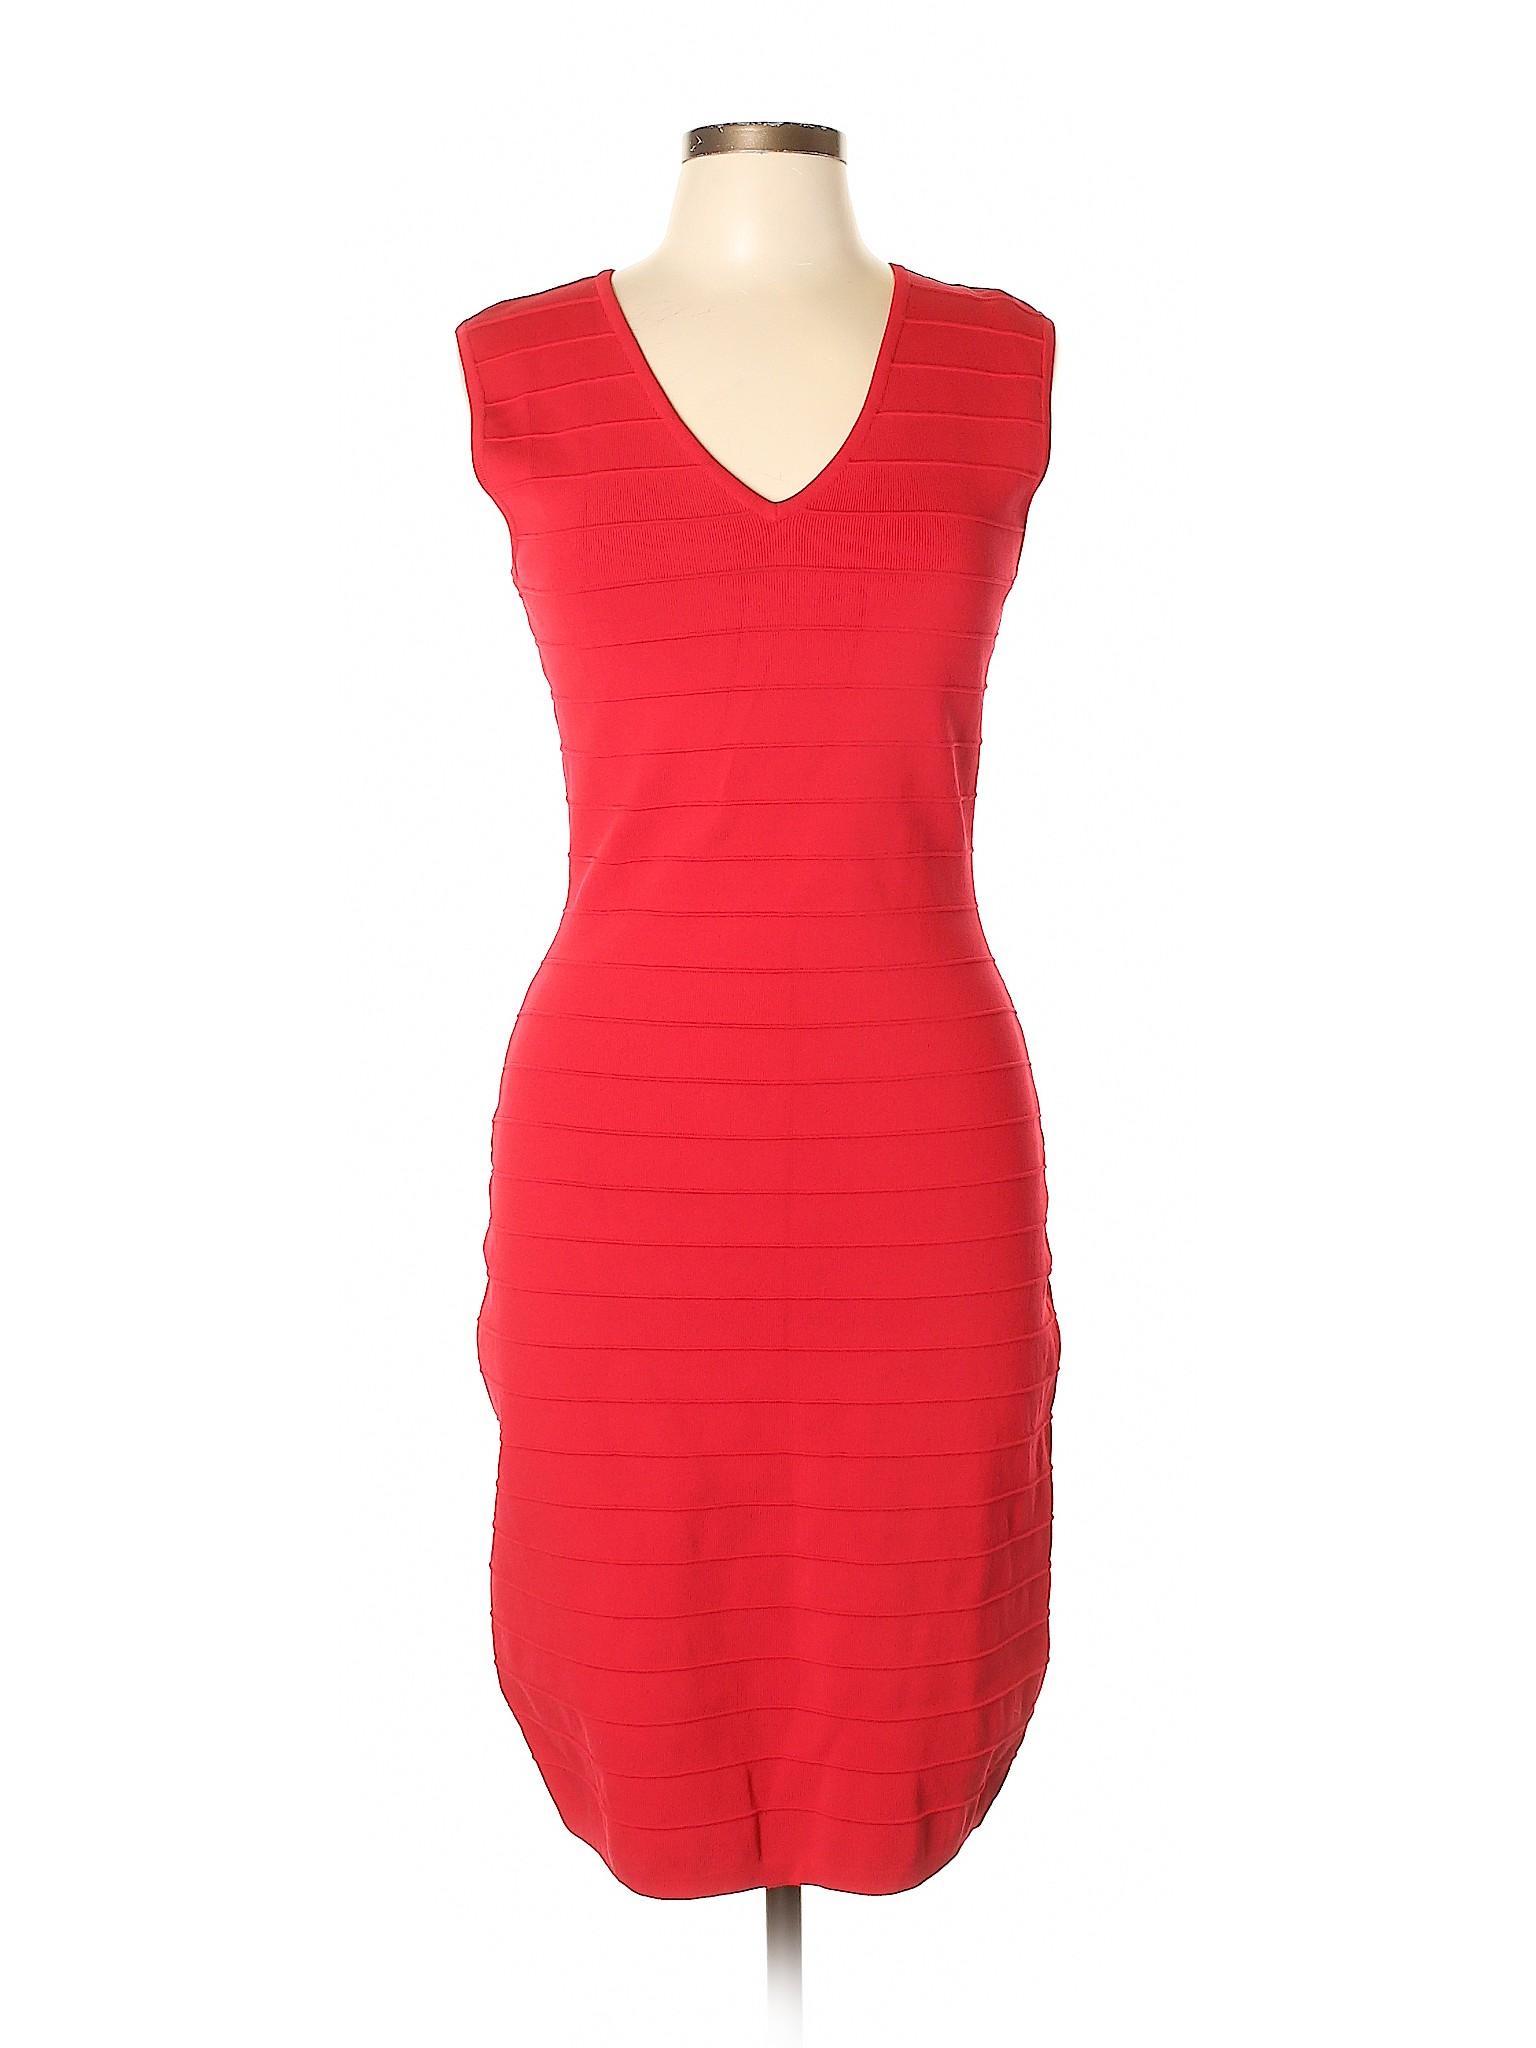 74ef37905b3 Red Cocktail Dress Neiman Marcus - Gomes Weine AG